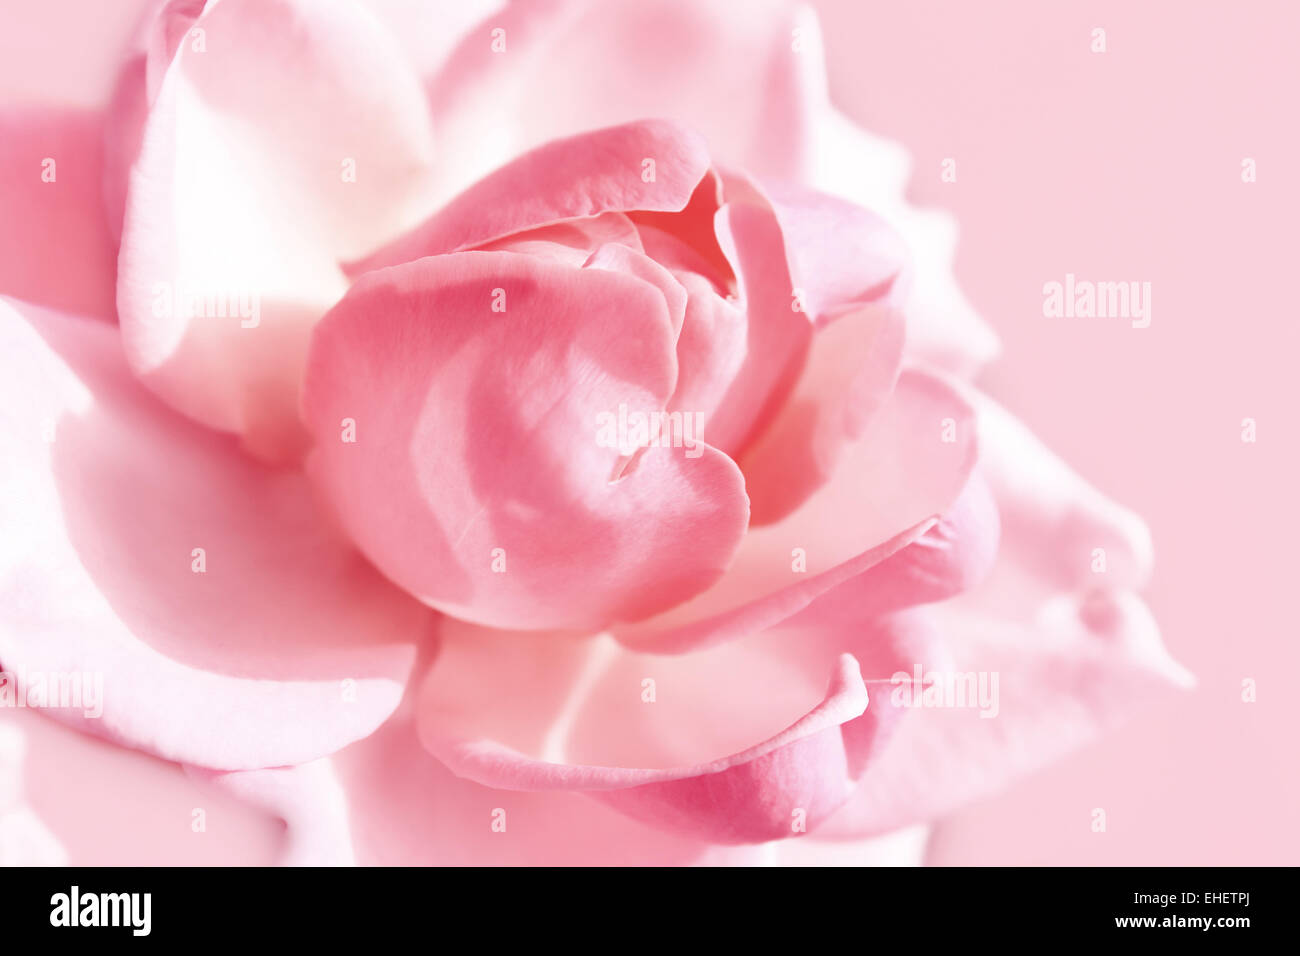 gentle pink rose - Stock Image